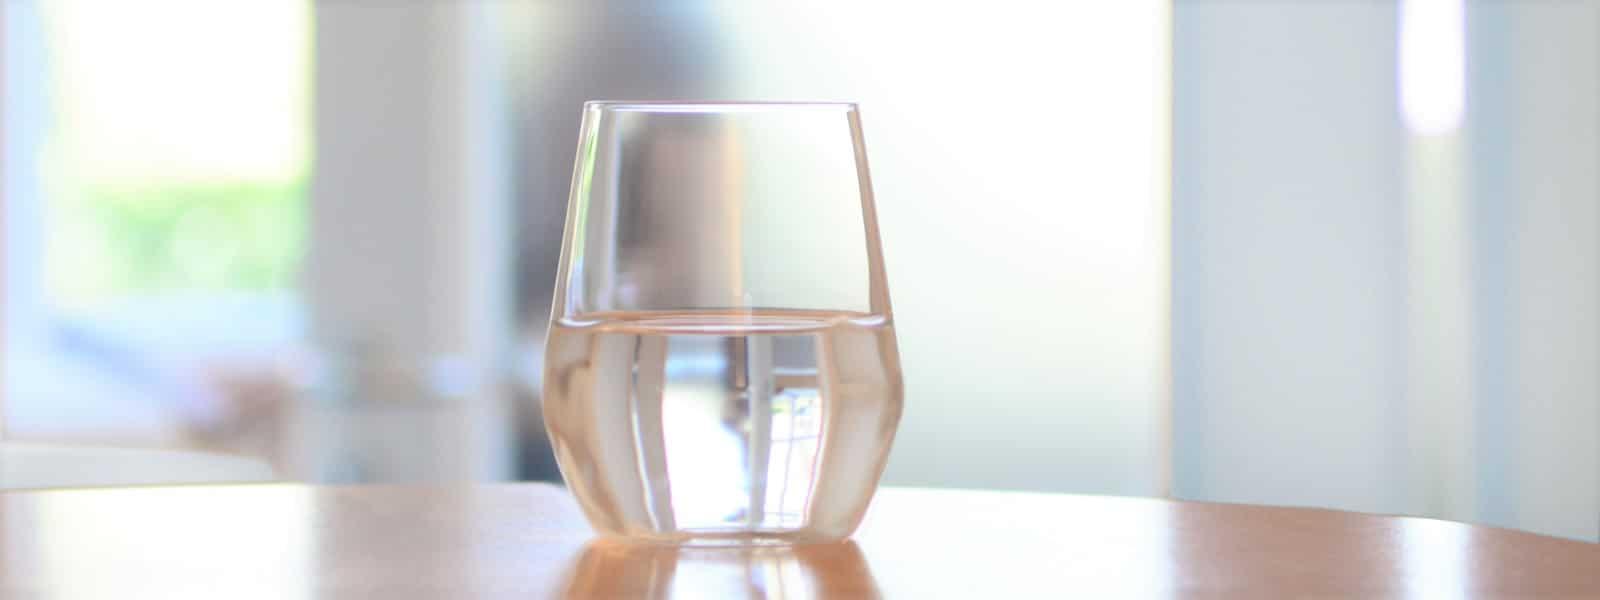 Symptome, Wasser